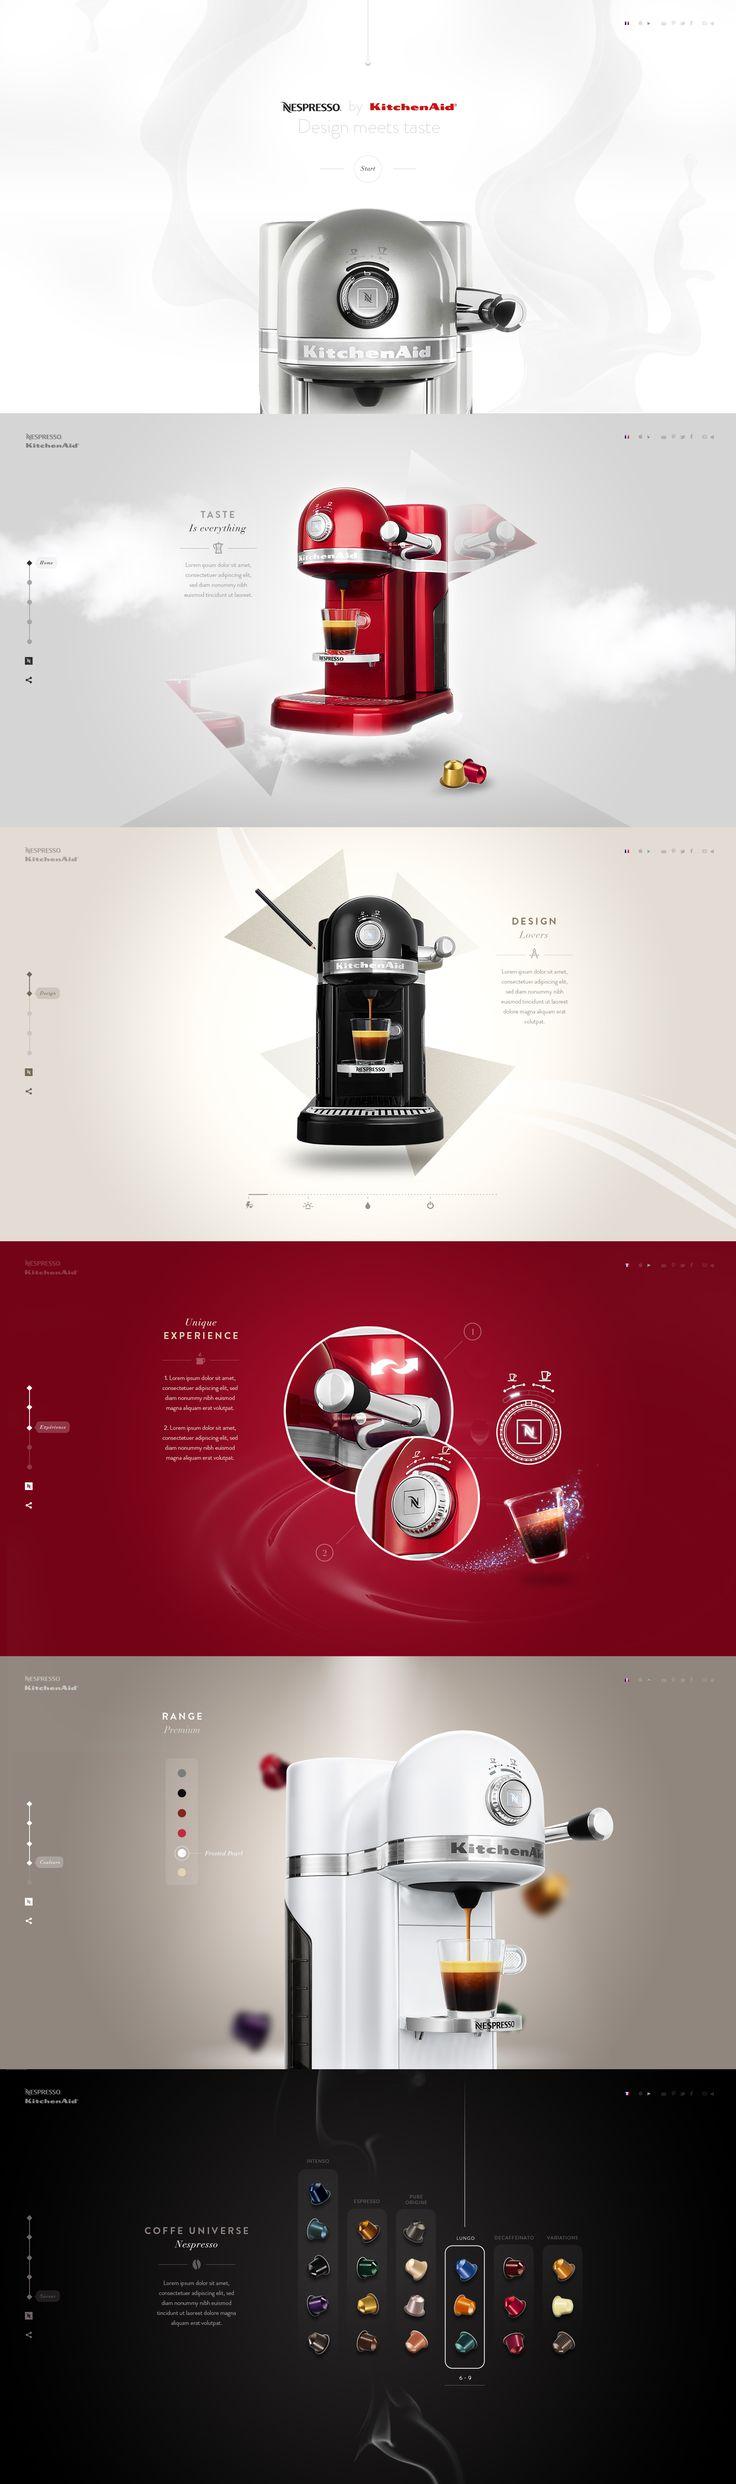 Nespresso by Kitchenaid by Steve Fraschini